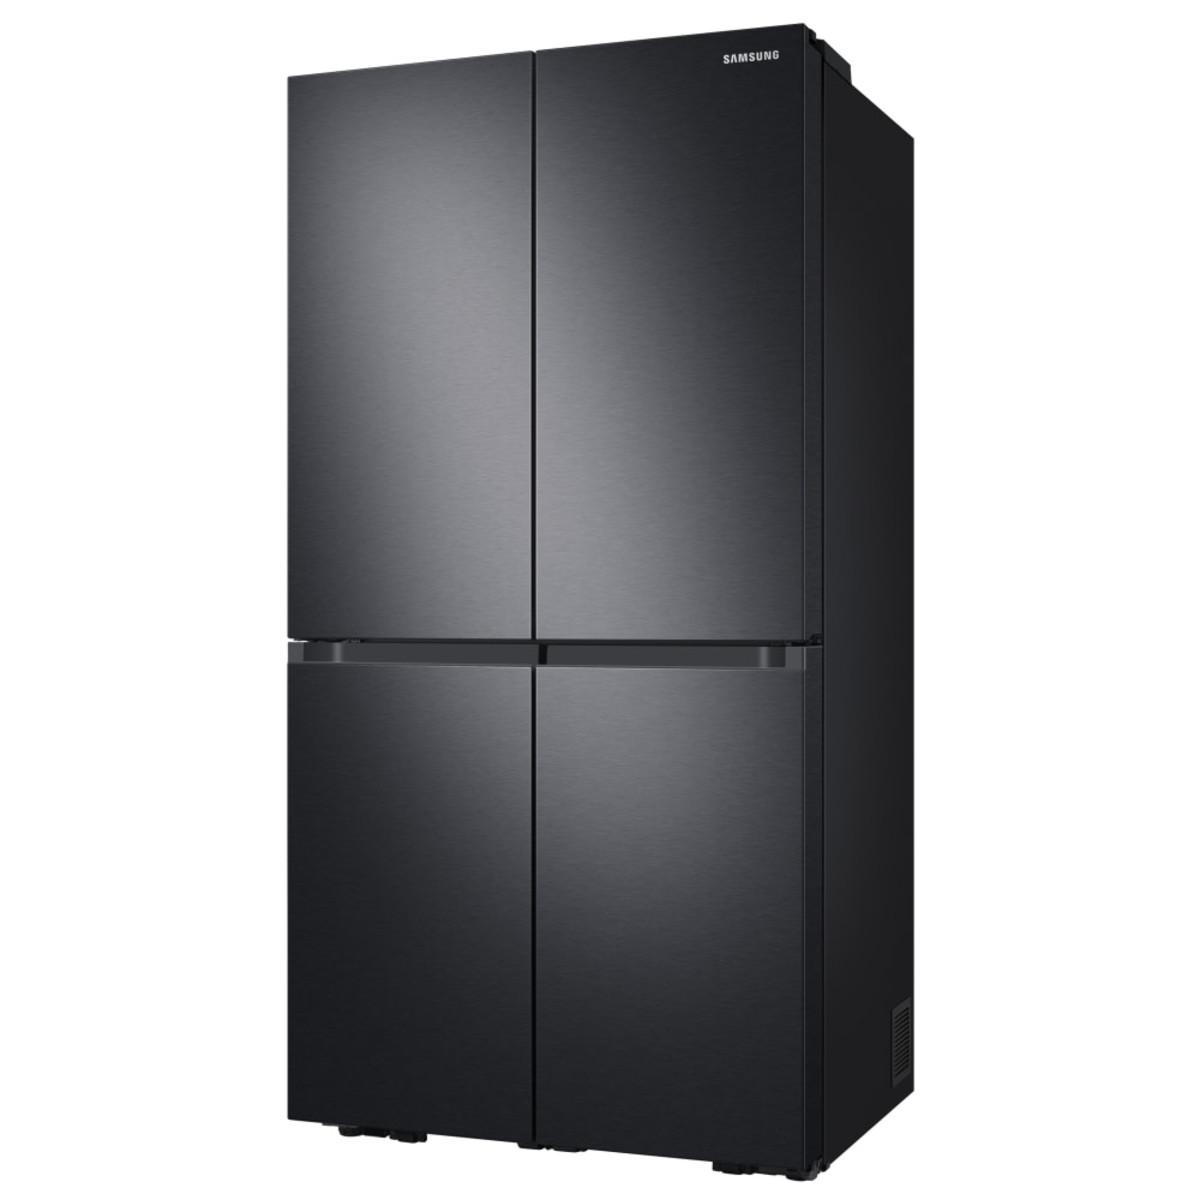 Samsung RF65A967FB1/EU RF9000 French Door Fridge Freezer with Beverage Centre